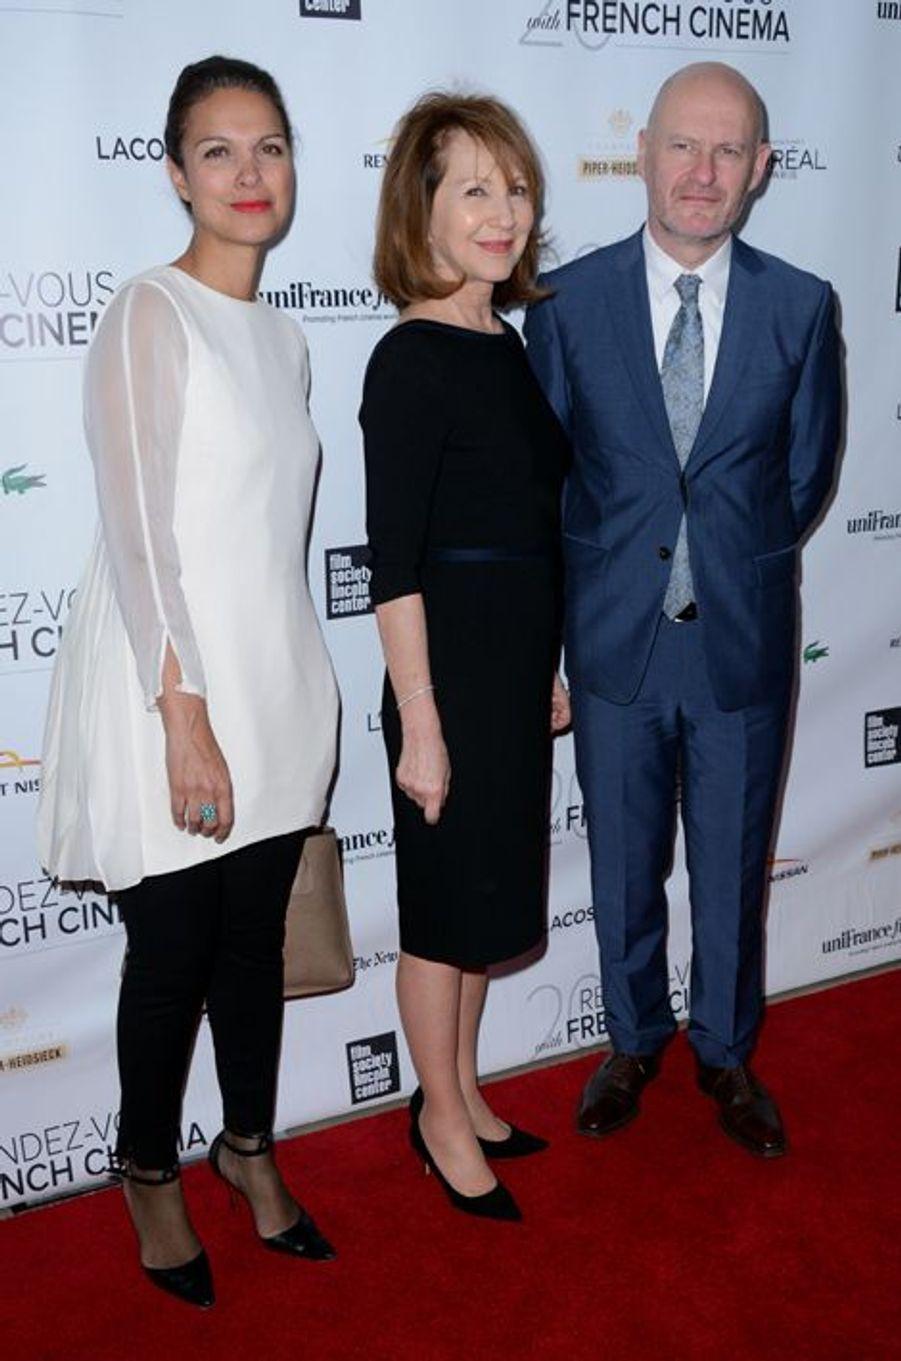 Nathalie Baye, avec Isabelle Giordano et Jean-Paul Salomé, à New York, le 6 mars 2015